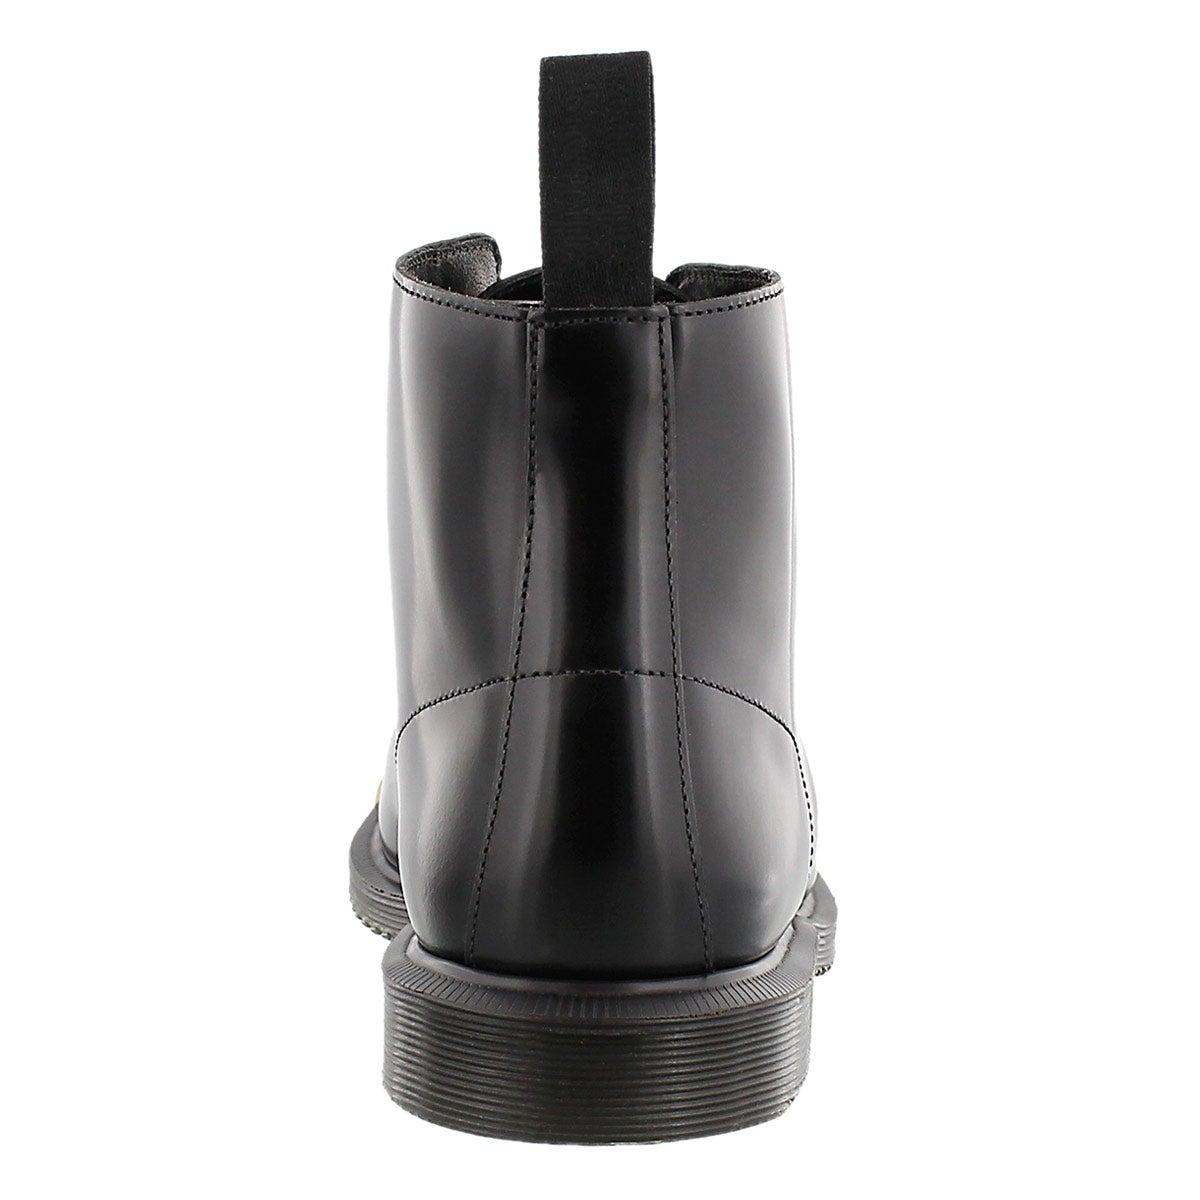 Lds Kensington Emmeline 5-Eye blk boot